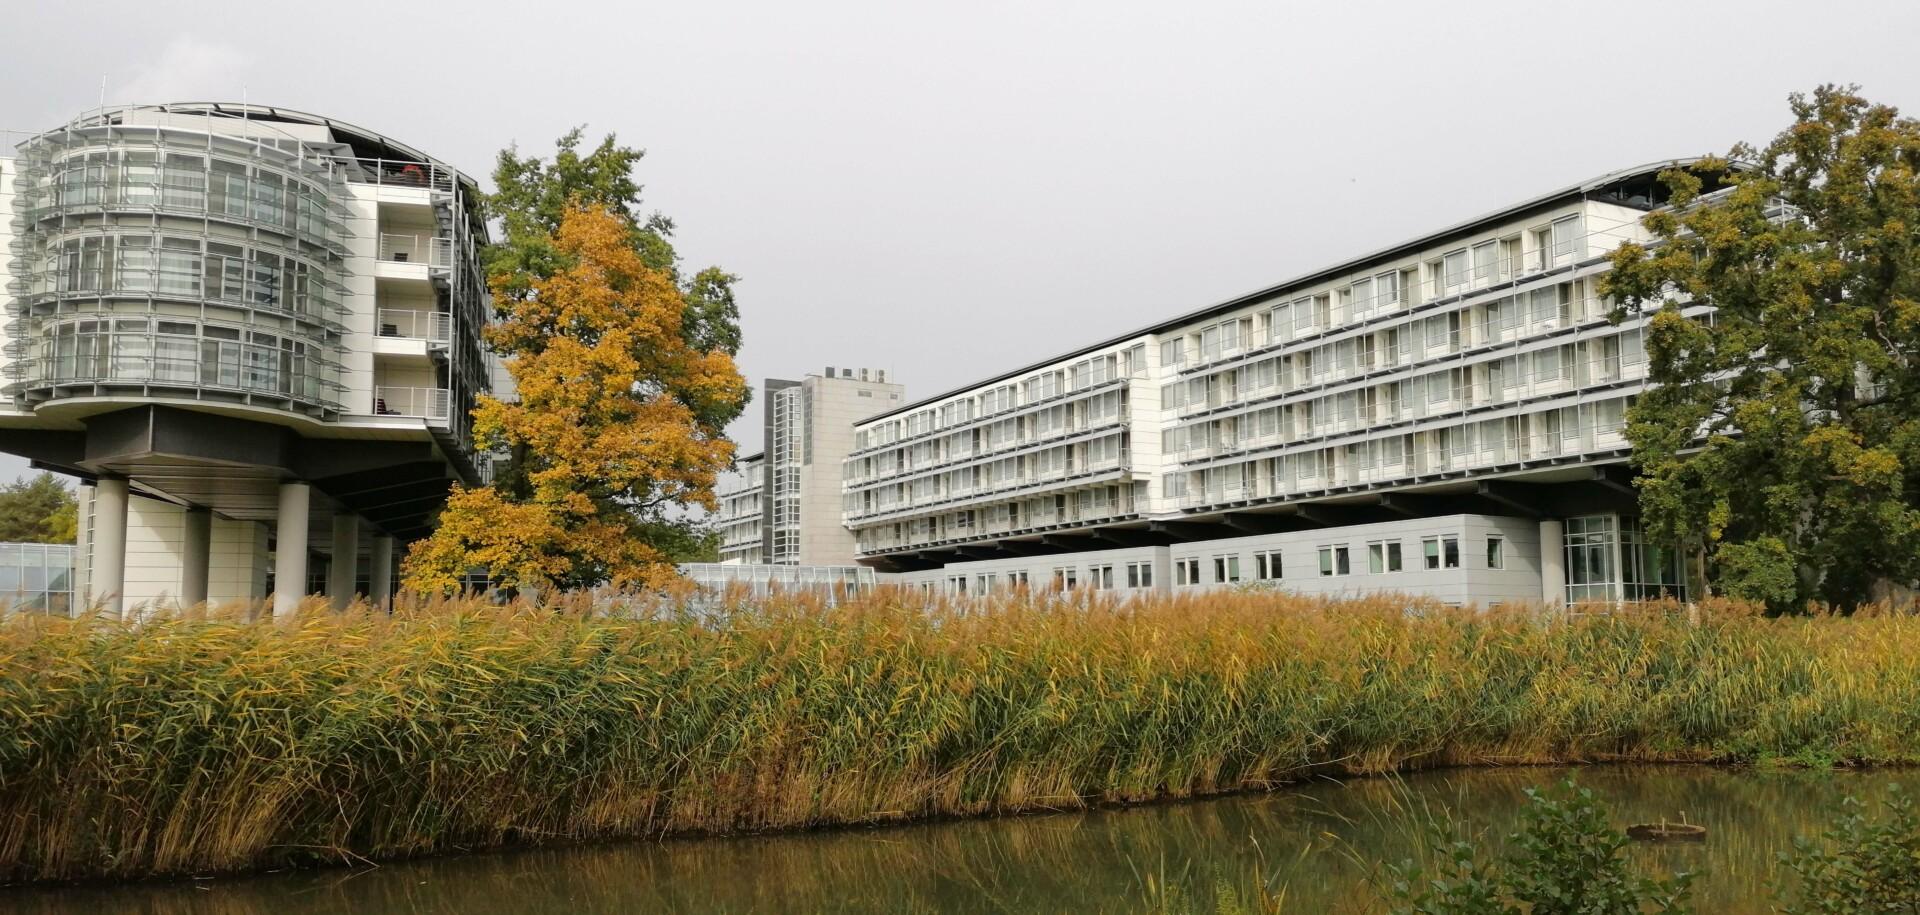 Kongresshotel Potsdam, Foto: PMSG/ André Stiebitz